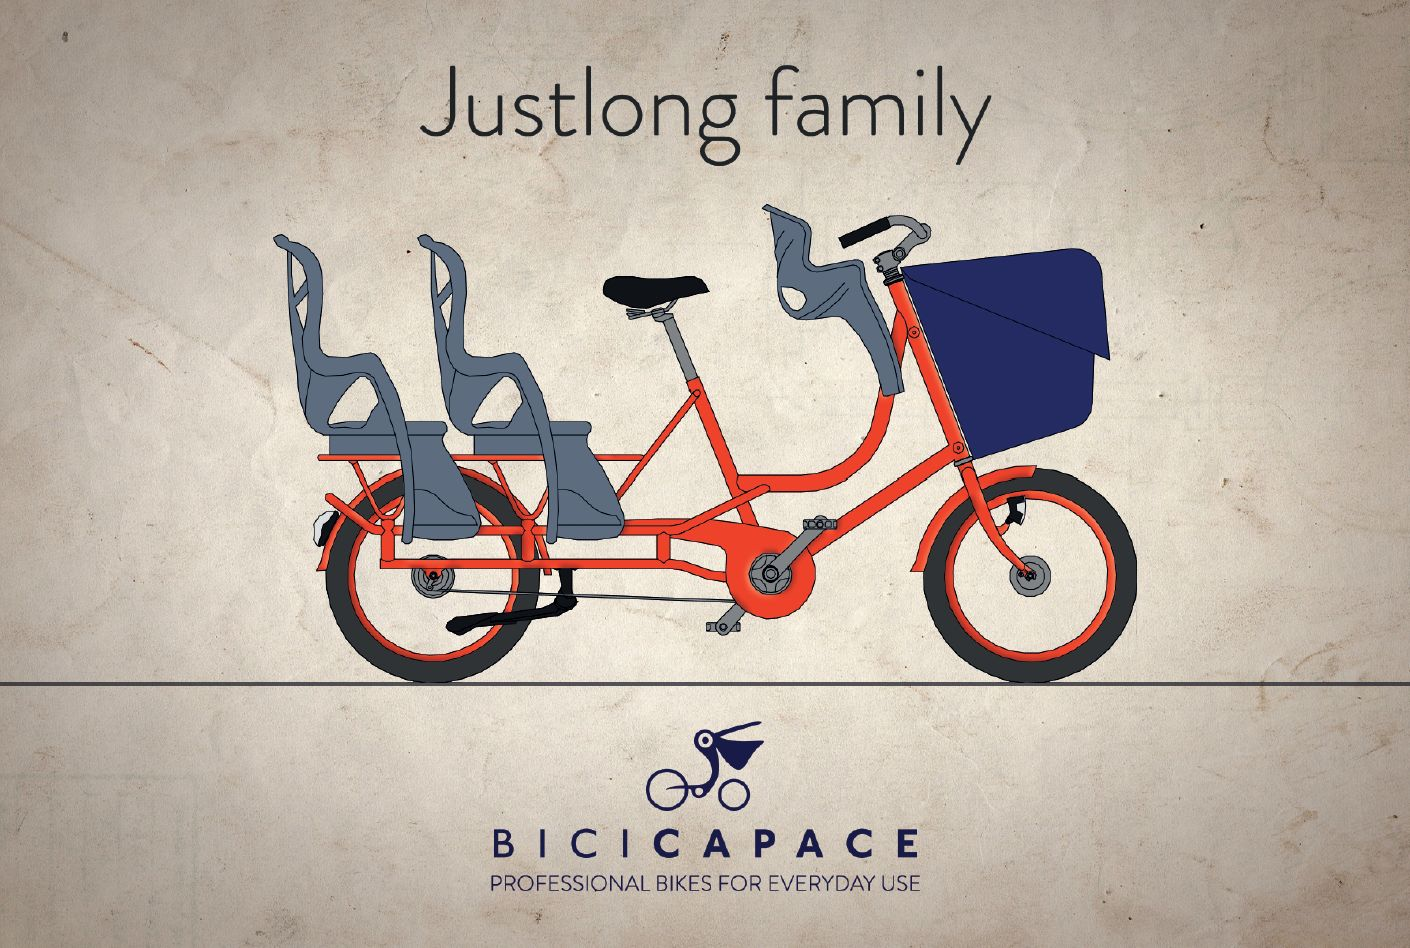 JustLong Bicicapace